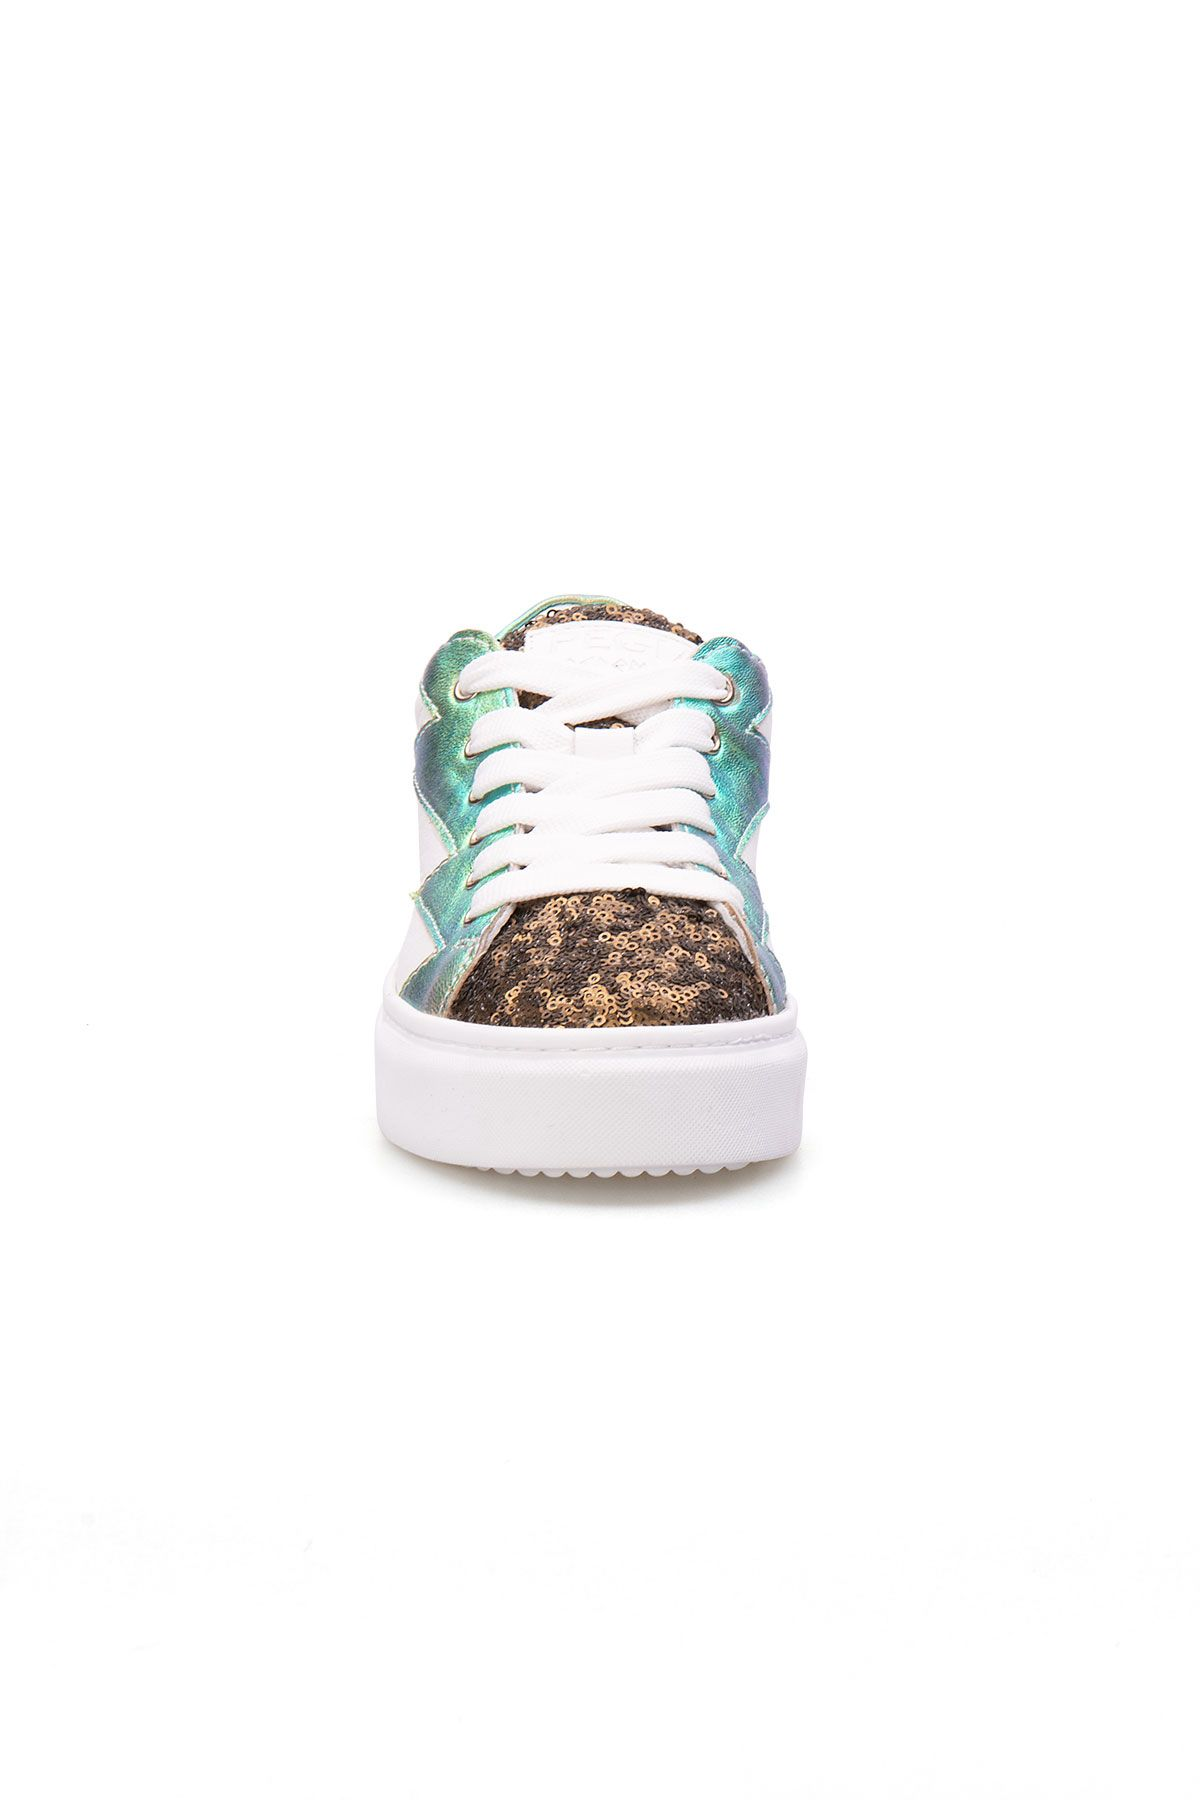 Pegia Genuine Leather Sequined Women's Sneaker LA1502 Golden